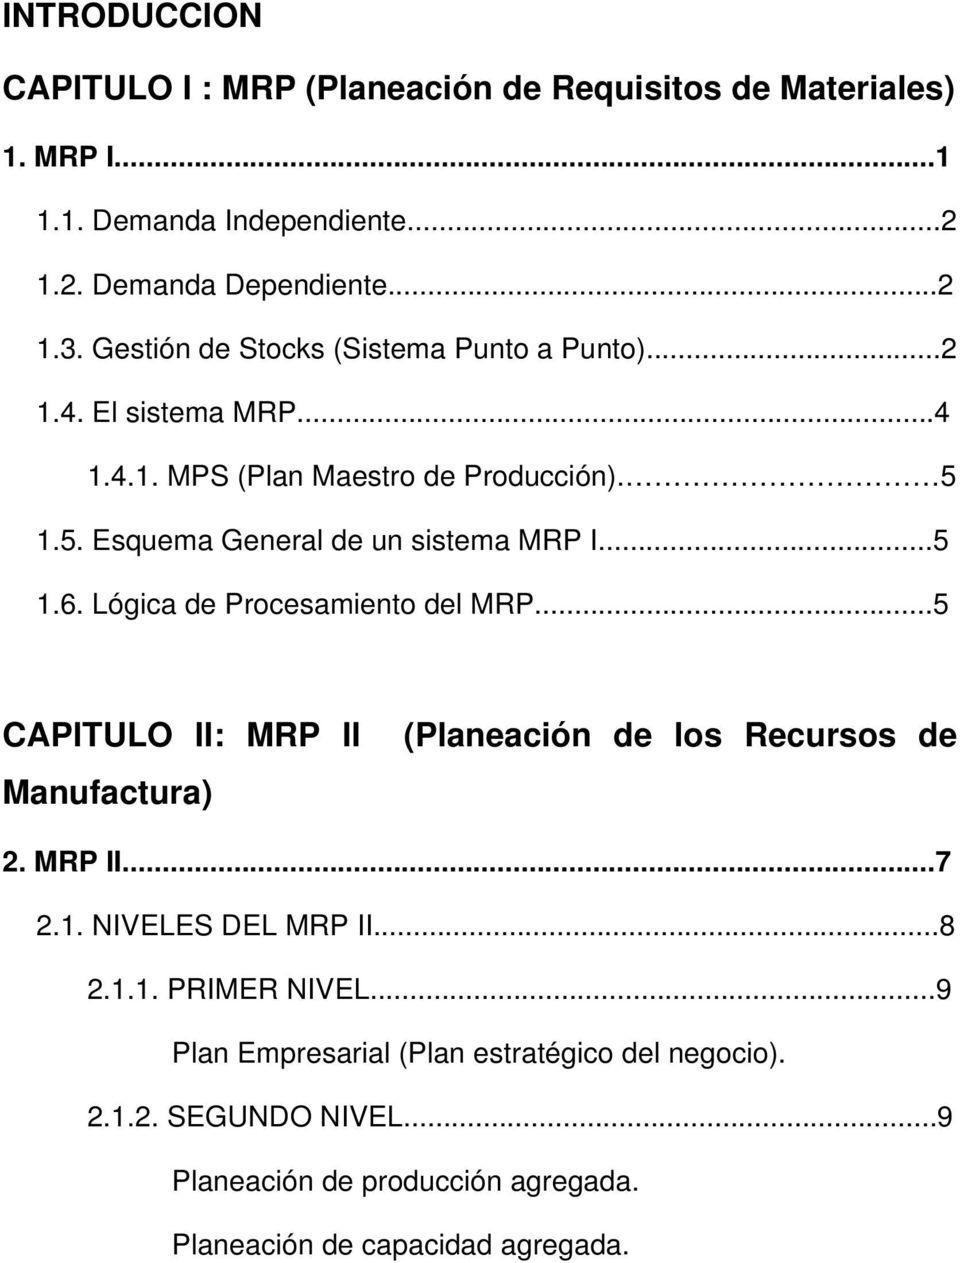 hight resolution of l gica de procesamiento del mrp 5 capitulo ii